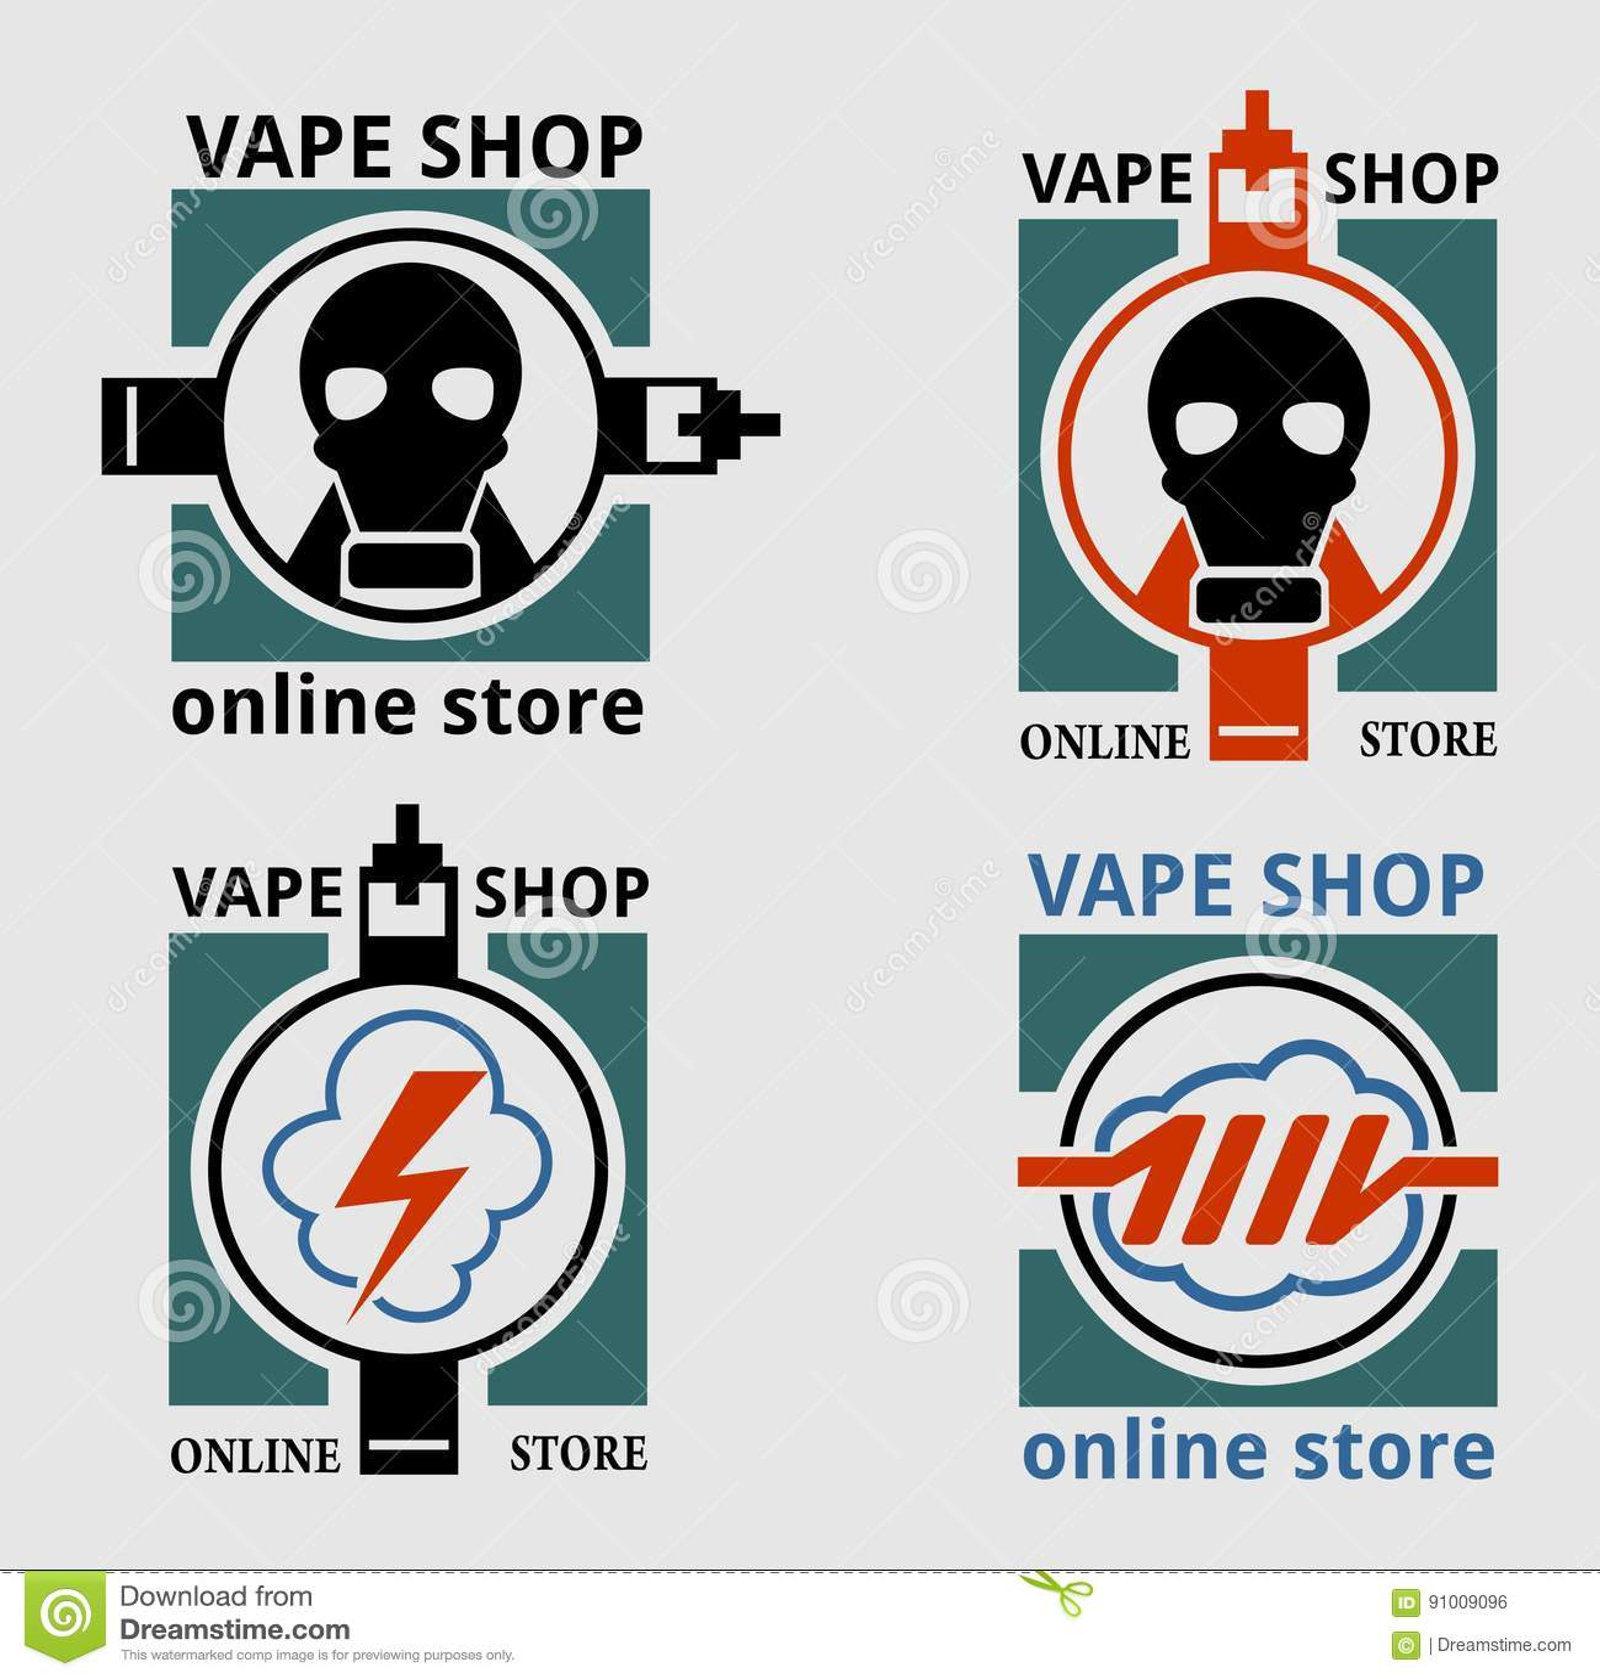 Vape shop online